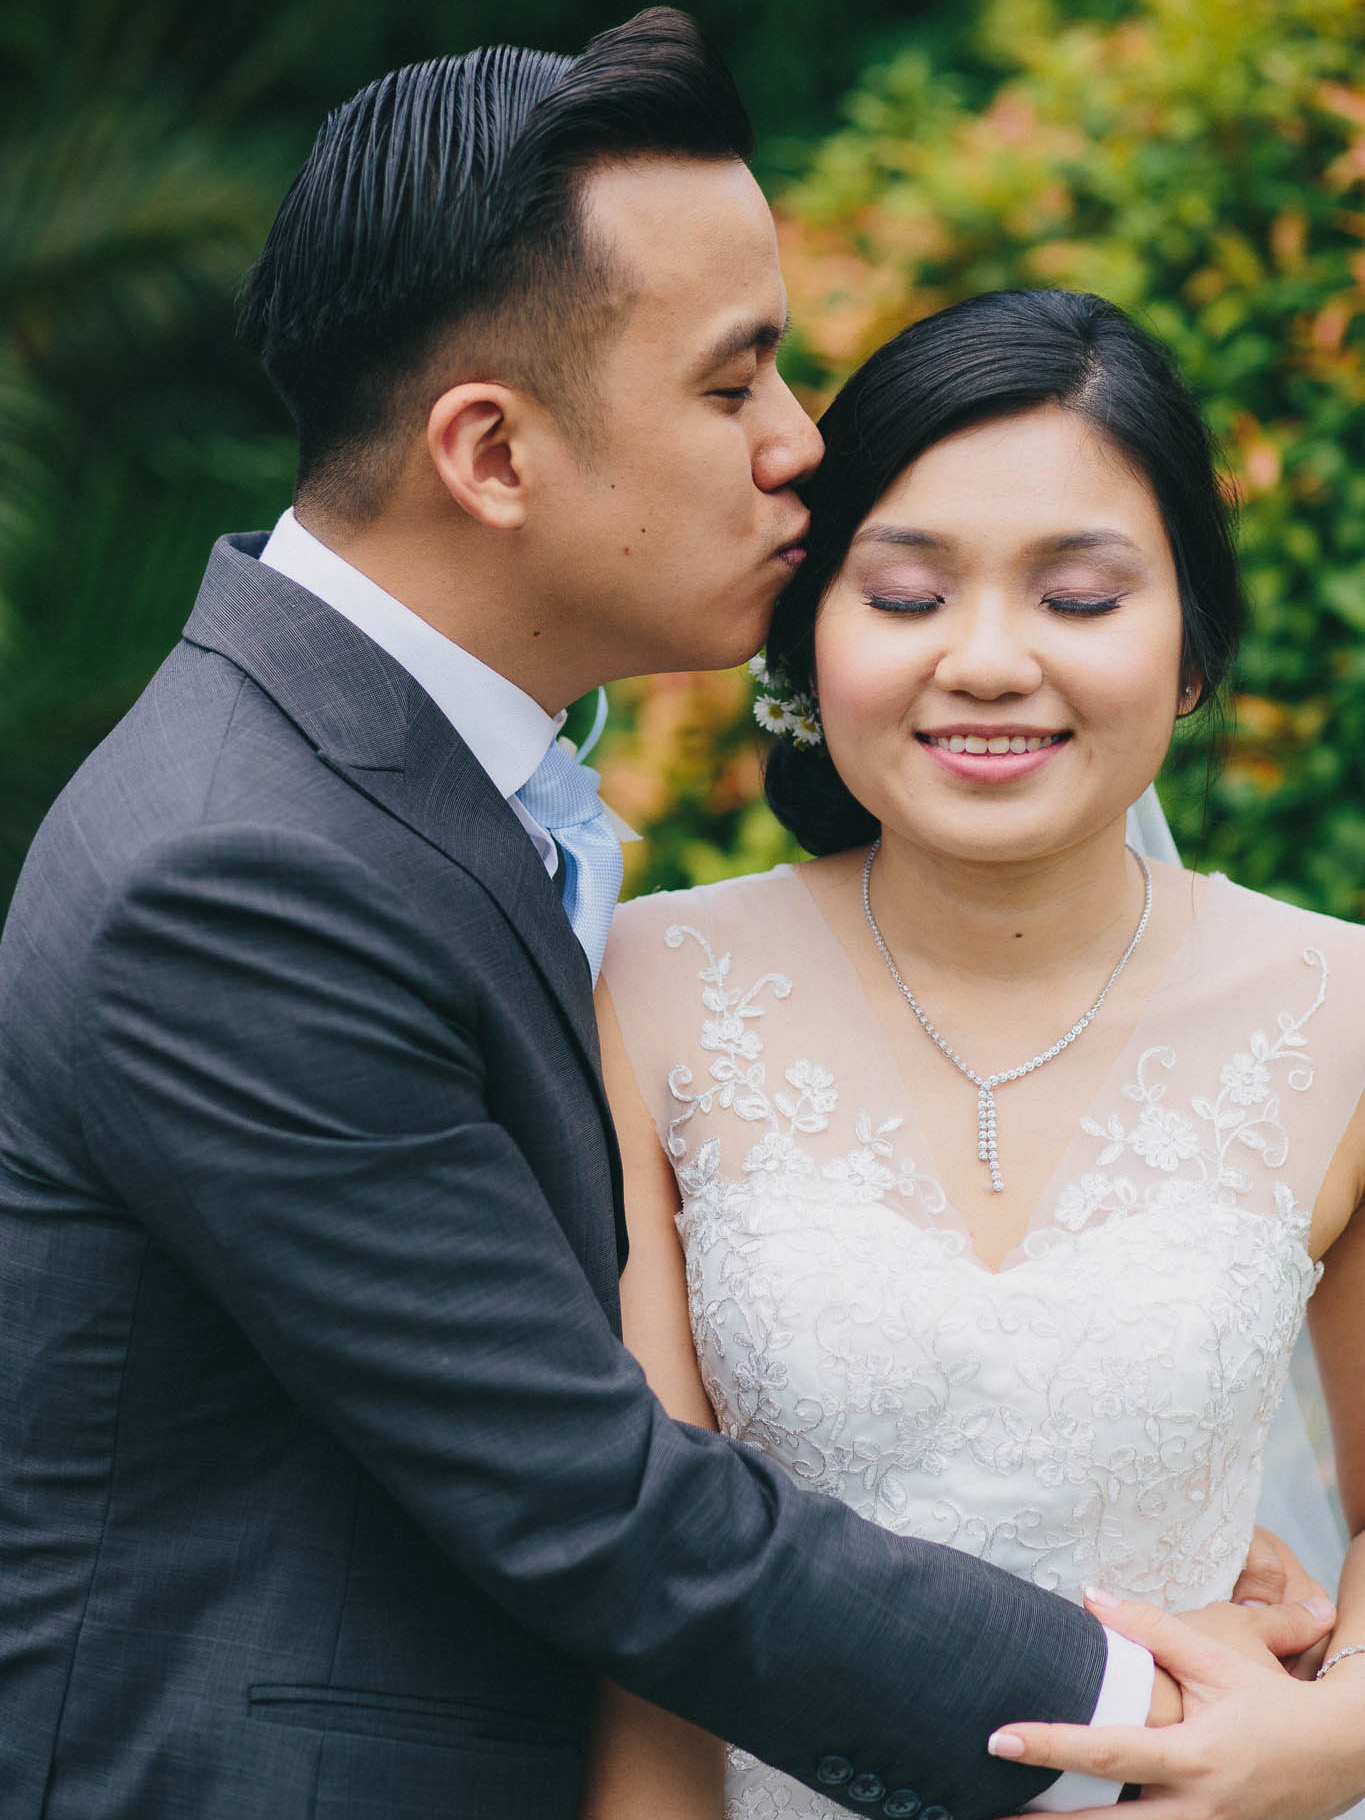 singapore-wedding-photographer-malay-indian-pre-wedding-travel-wmt-2015-37.jpg